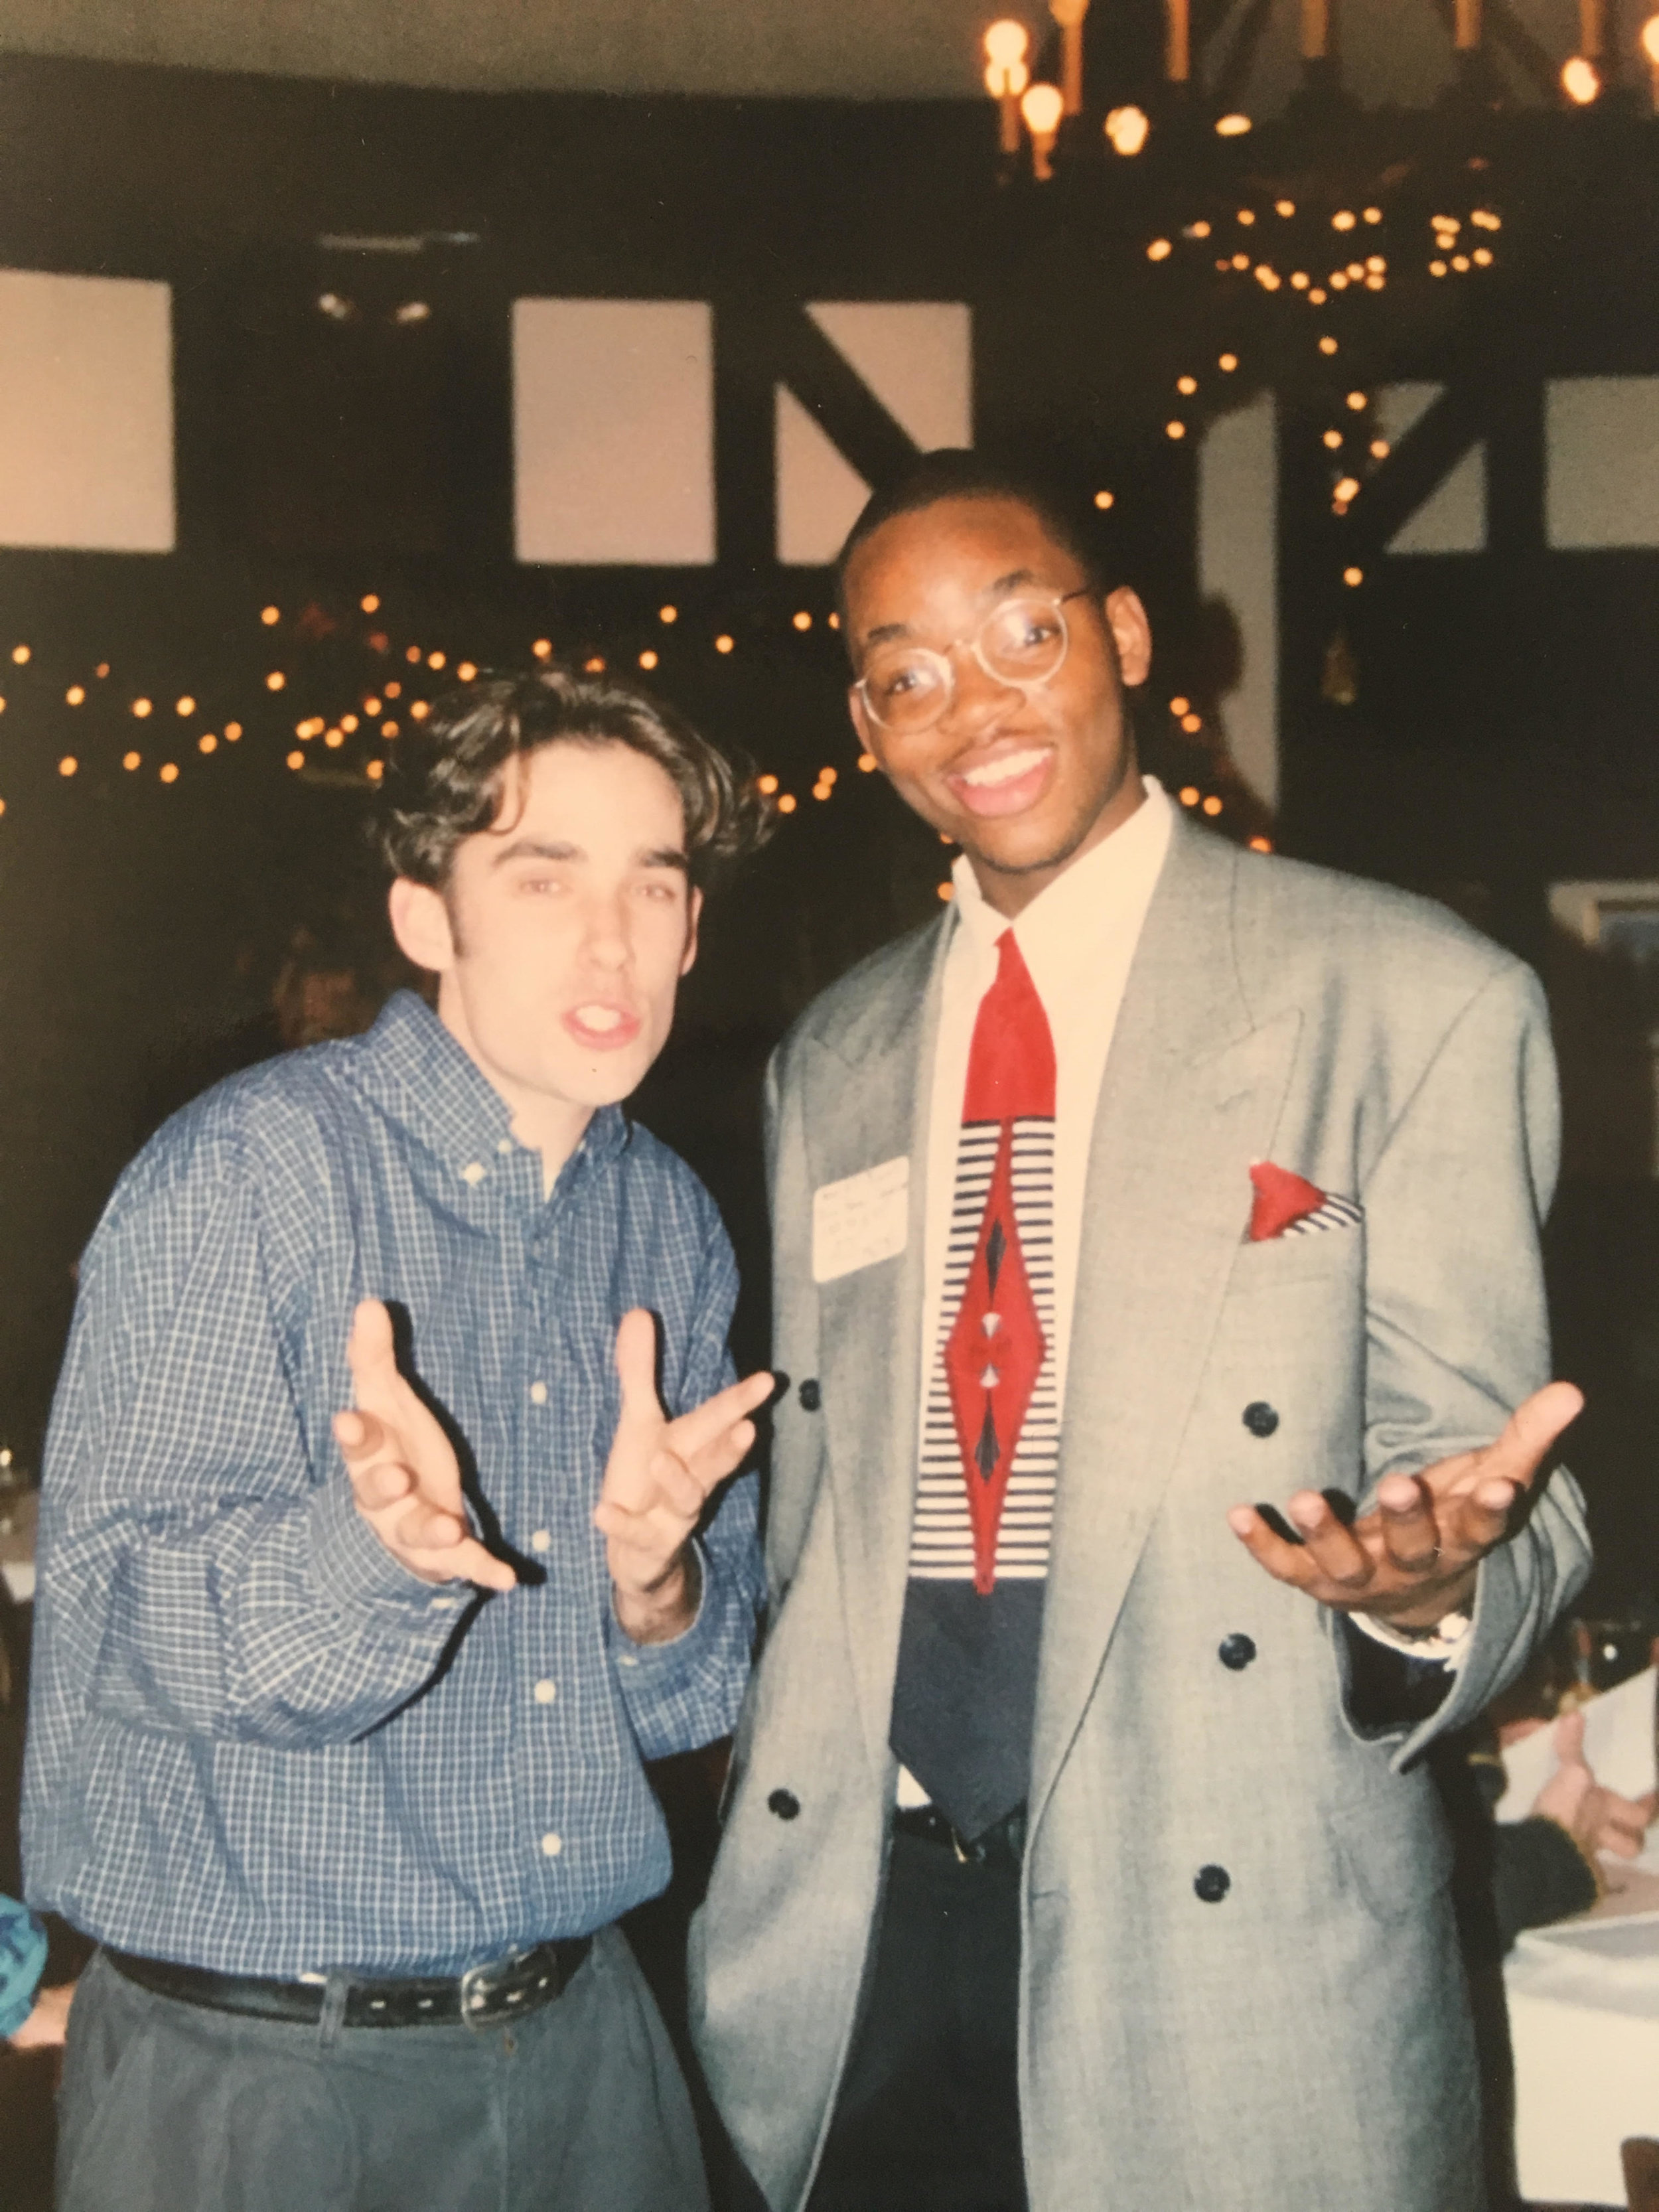 Jonah   Wittkamper and fellow Camp Rising Sun alumnus Aaron Jenkins ('96, '97) at a CRS event.